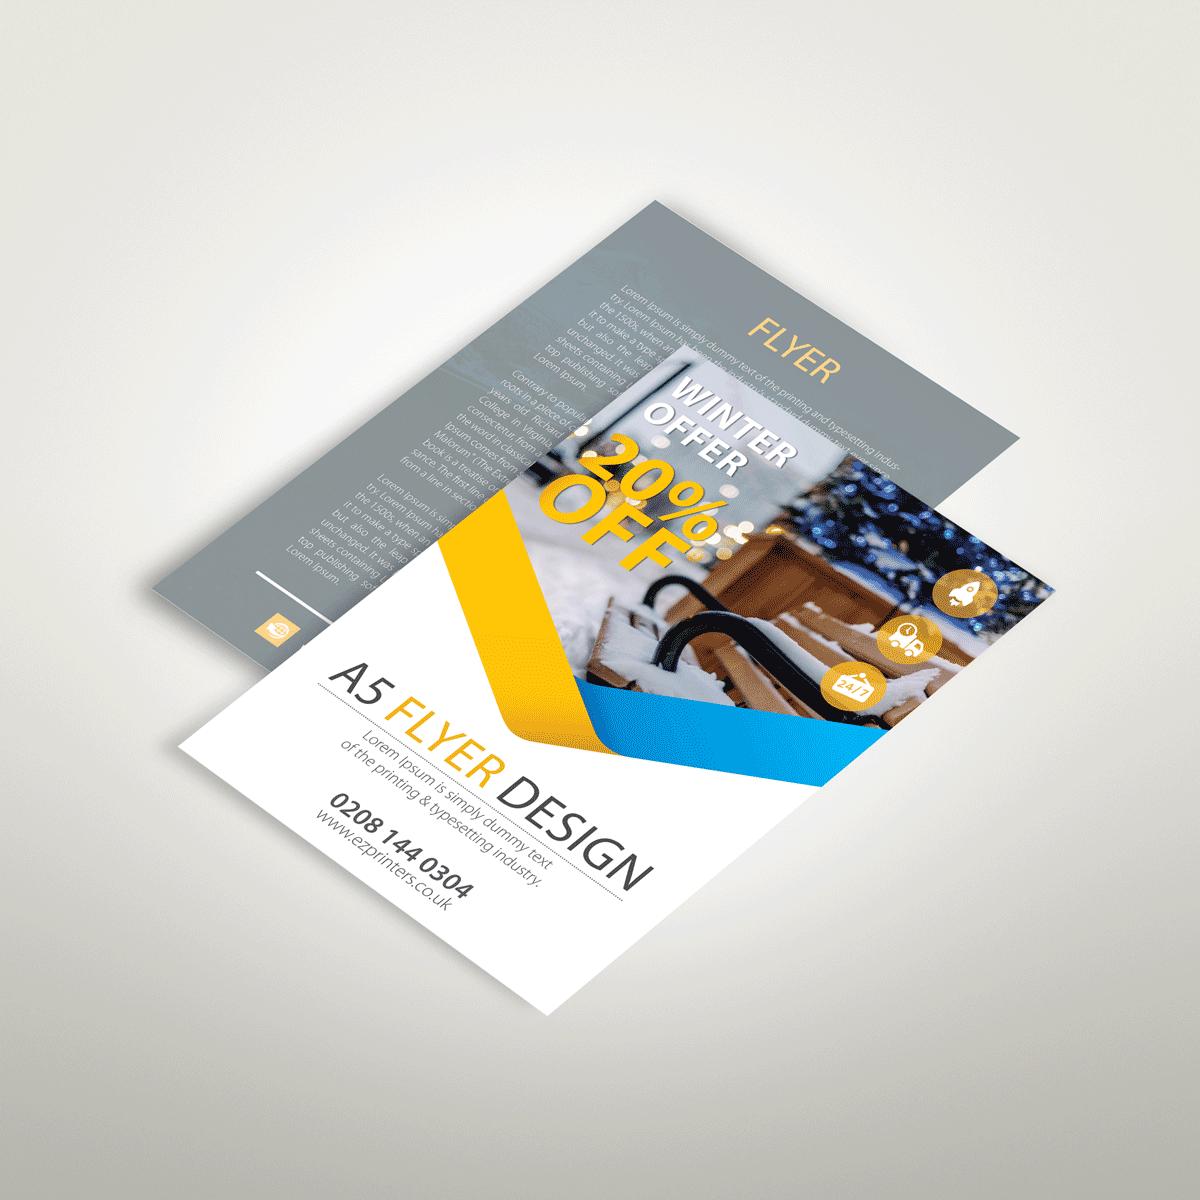 a5 flyers leaflets printing london ez printers